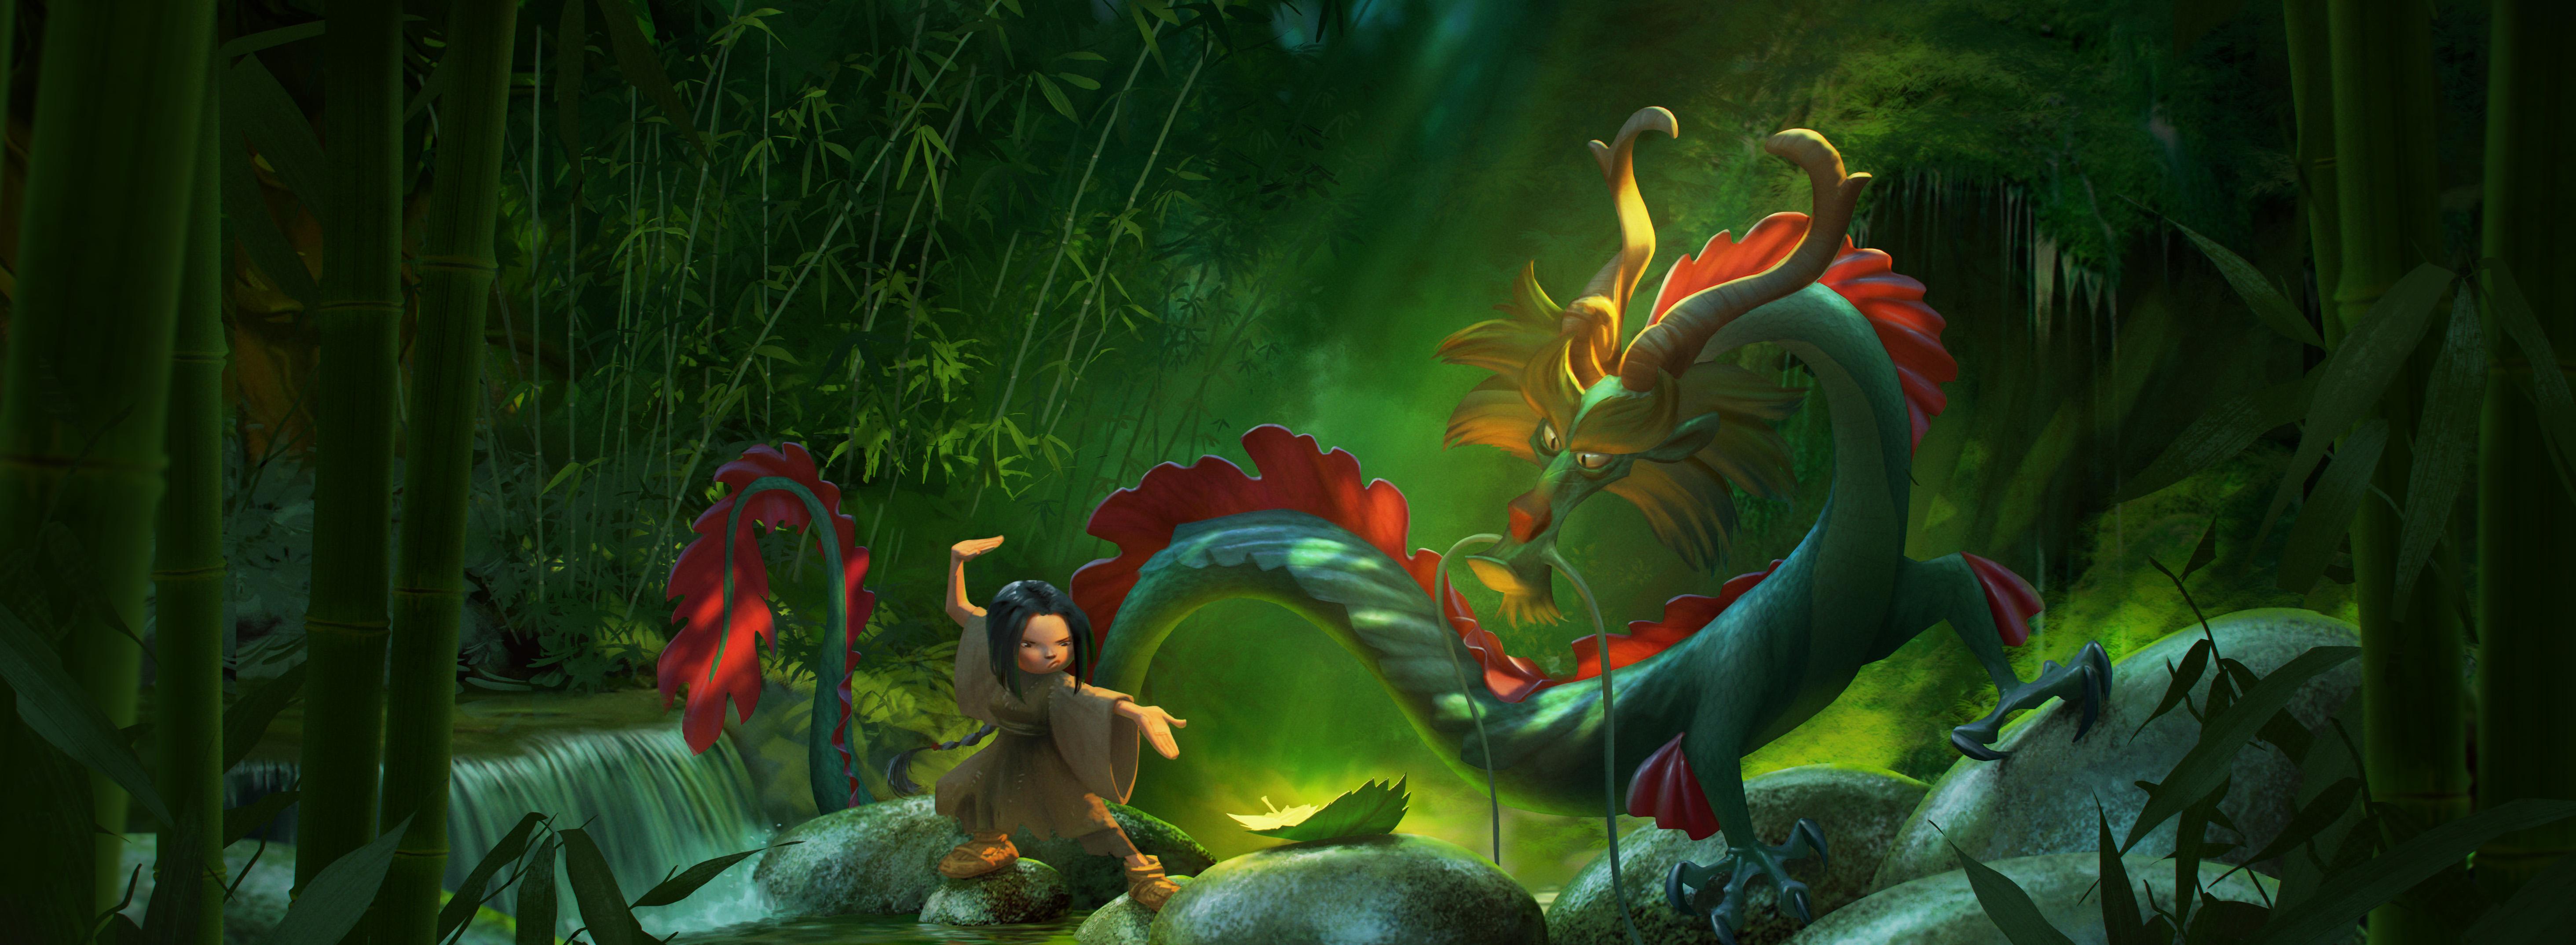 Click to enlarge image dragonkeeper.jpg